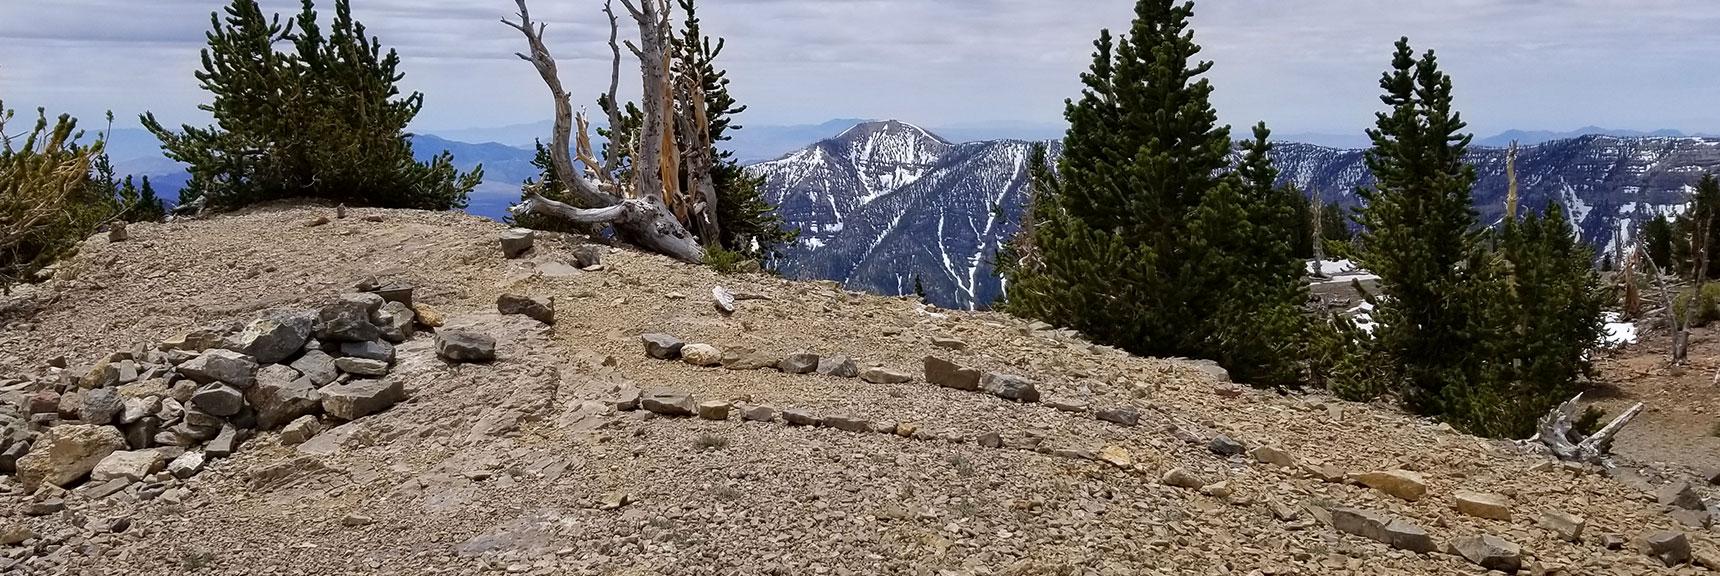 Summit and Summit Box of Mummy Mt. in Mt. Charleston Wilderness, Nevada